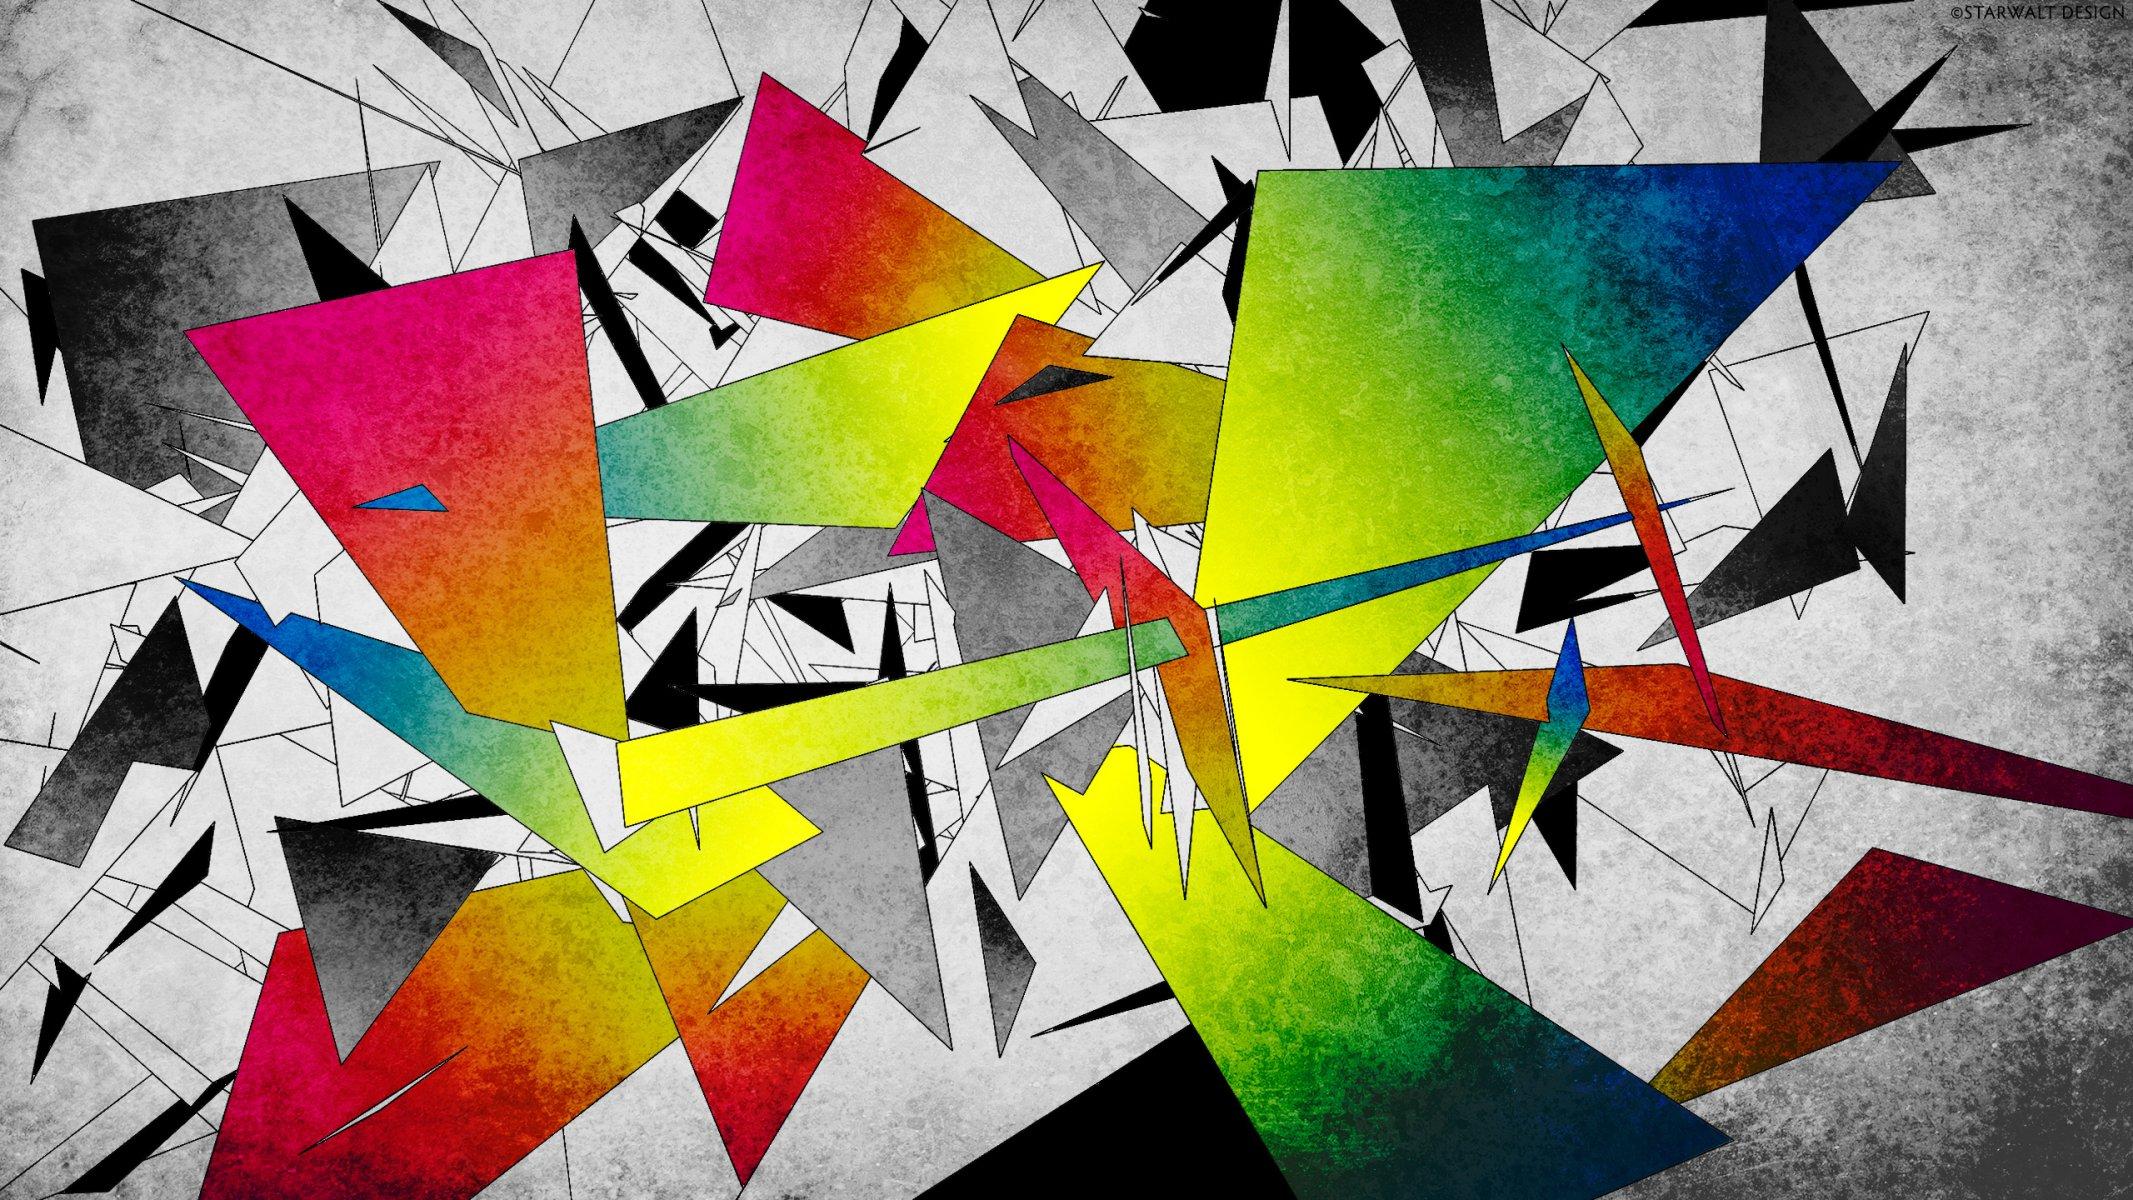 Обои полосы, фигуры, абстракции, Квадраты. Абстракции foto 16